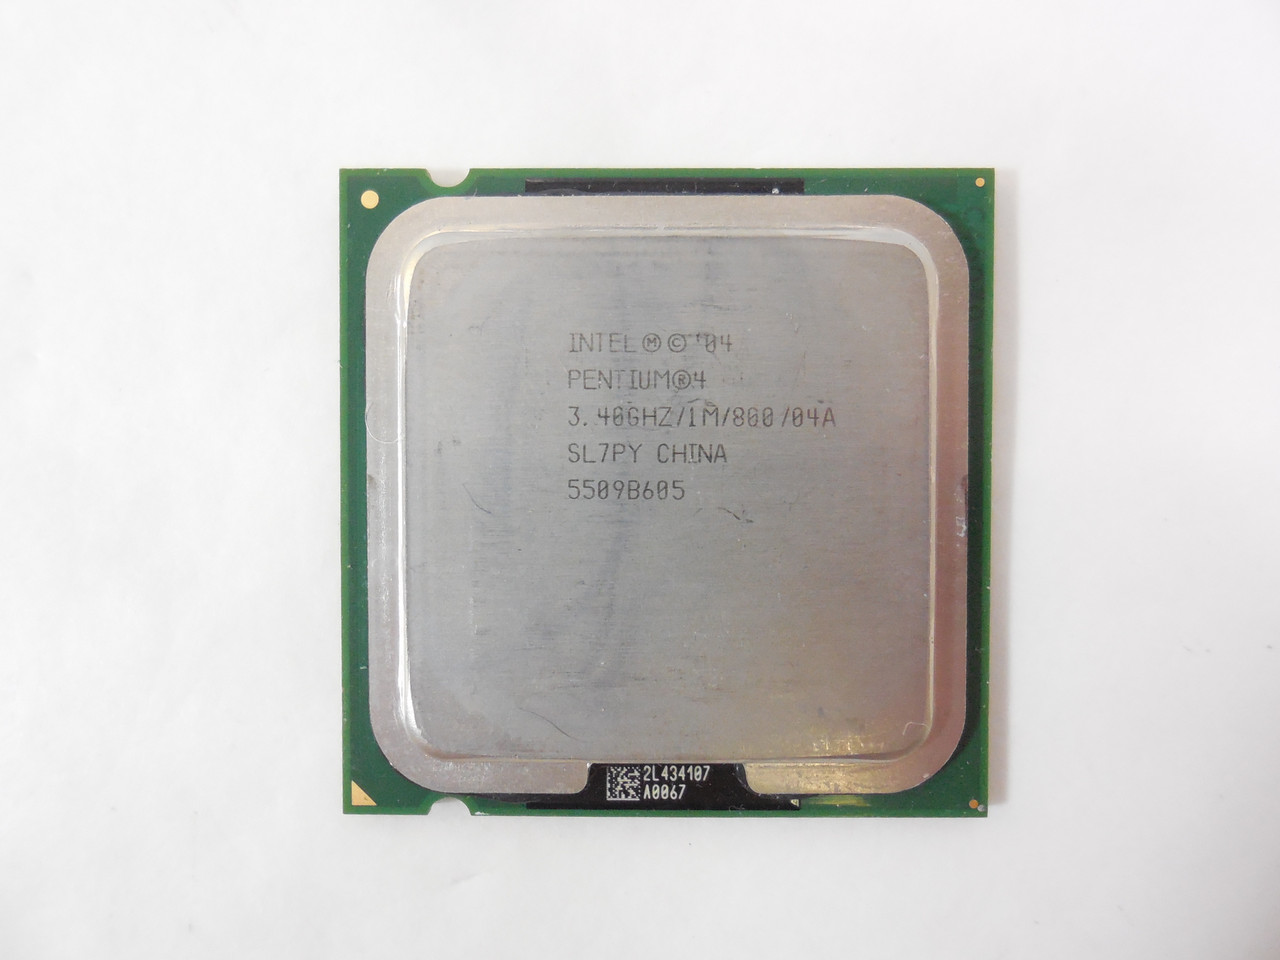 Процессор Intel Pentium 4 550 3.40GHz/1M/800 (SL7PY) s775, tray